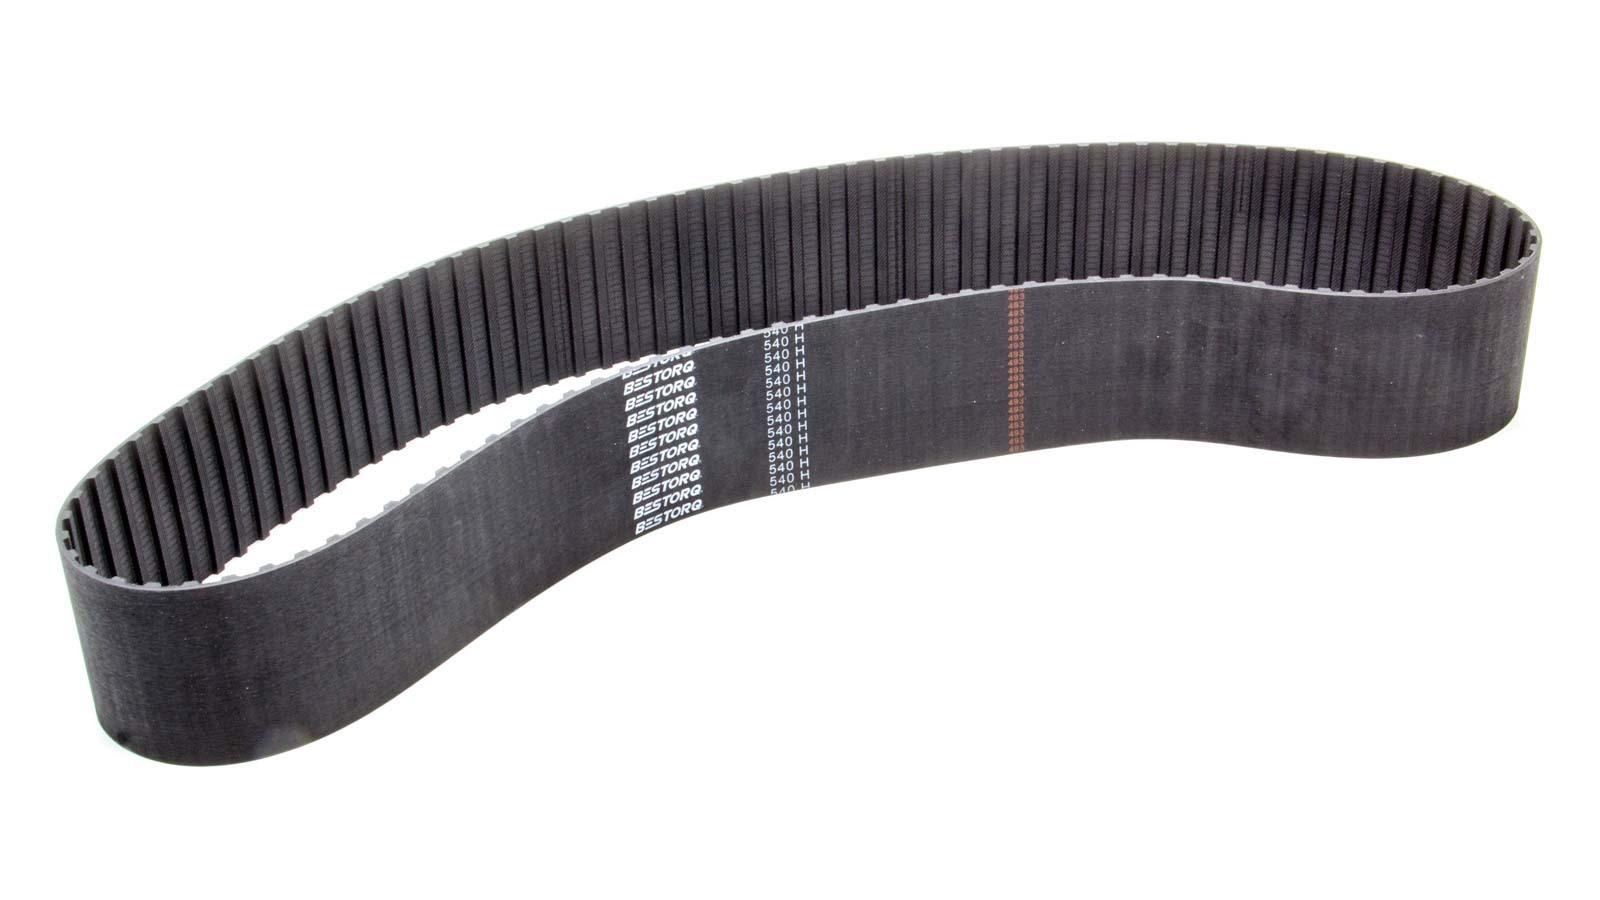 Blower Belt - 57 x 3 - 1/2 Pitch